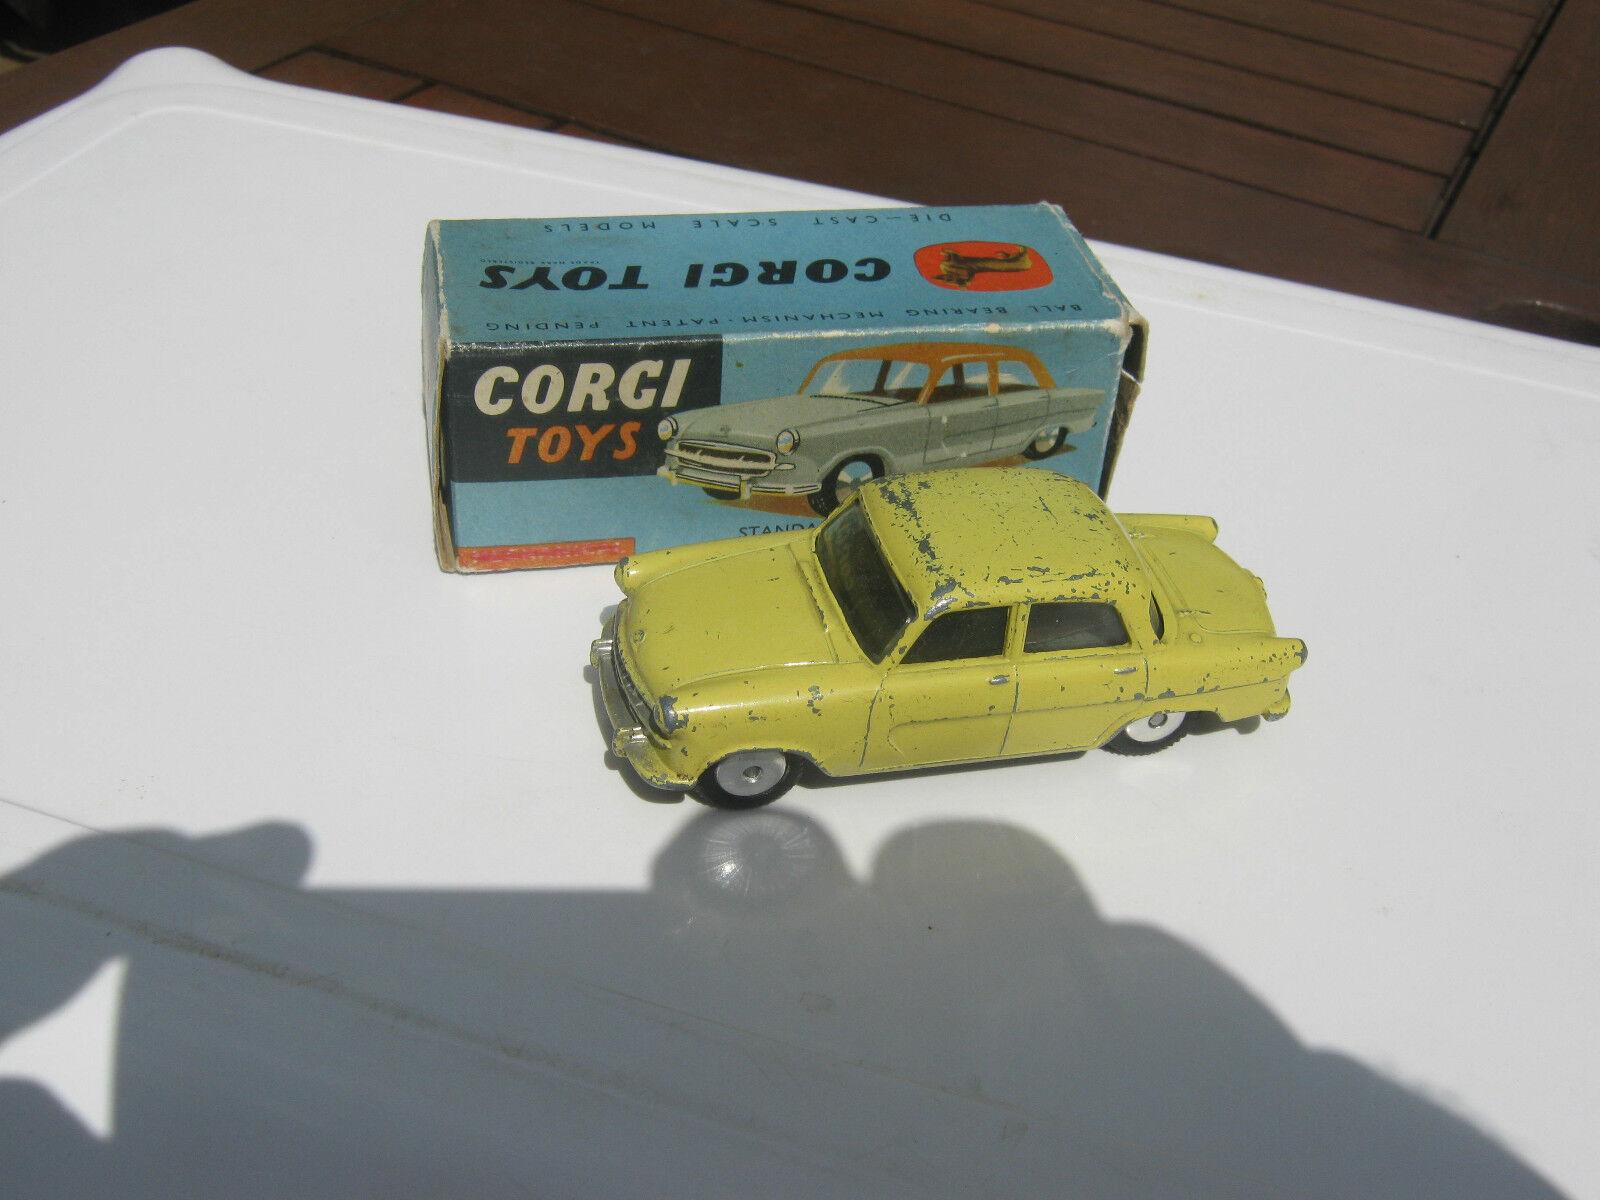 CORGI 207m stangaurd vangaurd mécanique de 1957 à 1959 original Voiture & box.